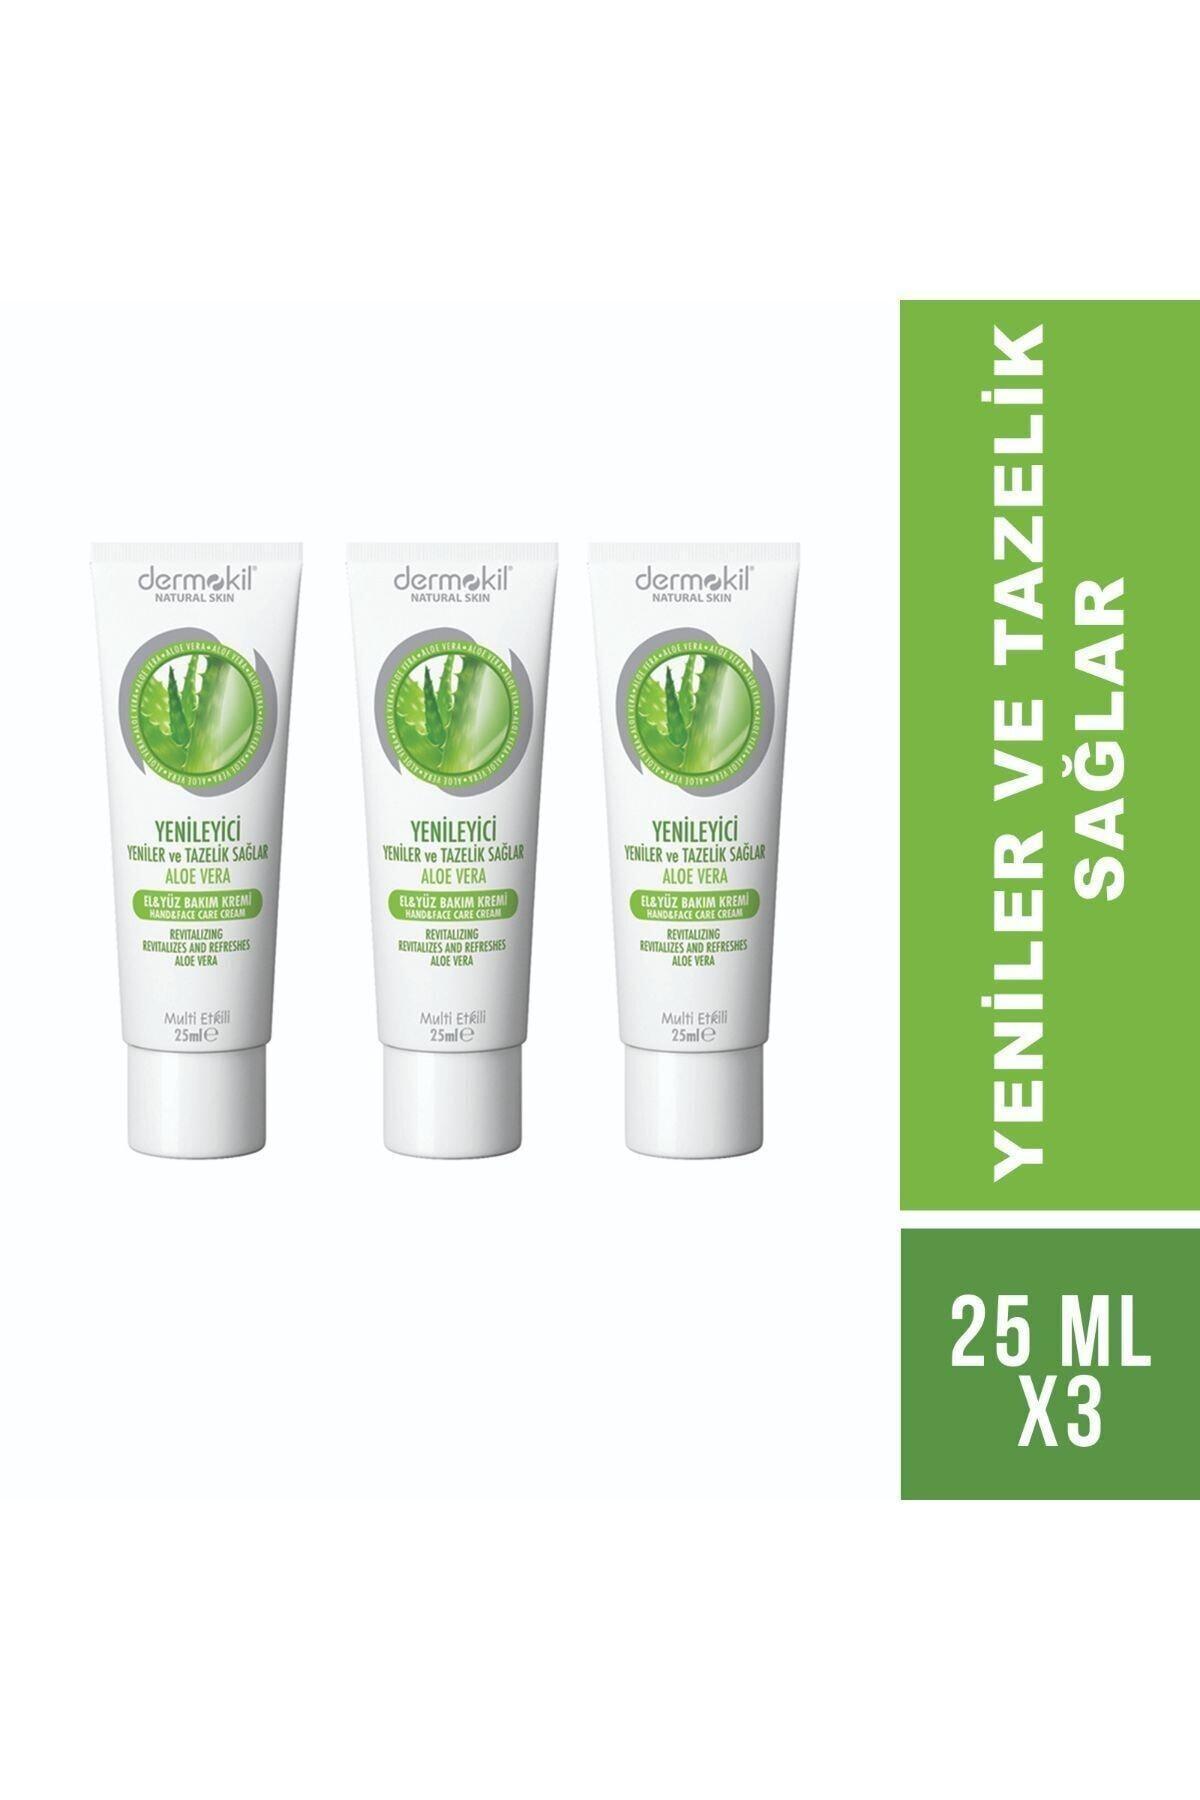 Dermokil Aloe Vera Özlü El Kremi 25 ml X3 2